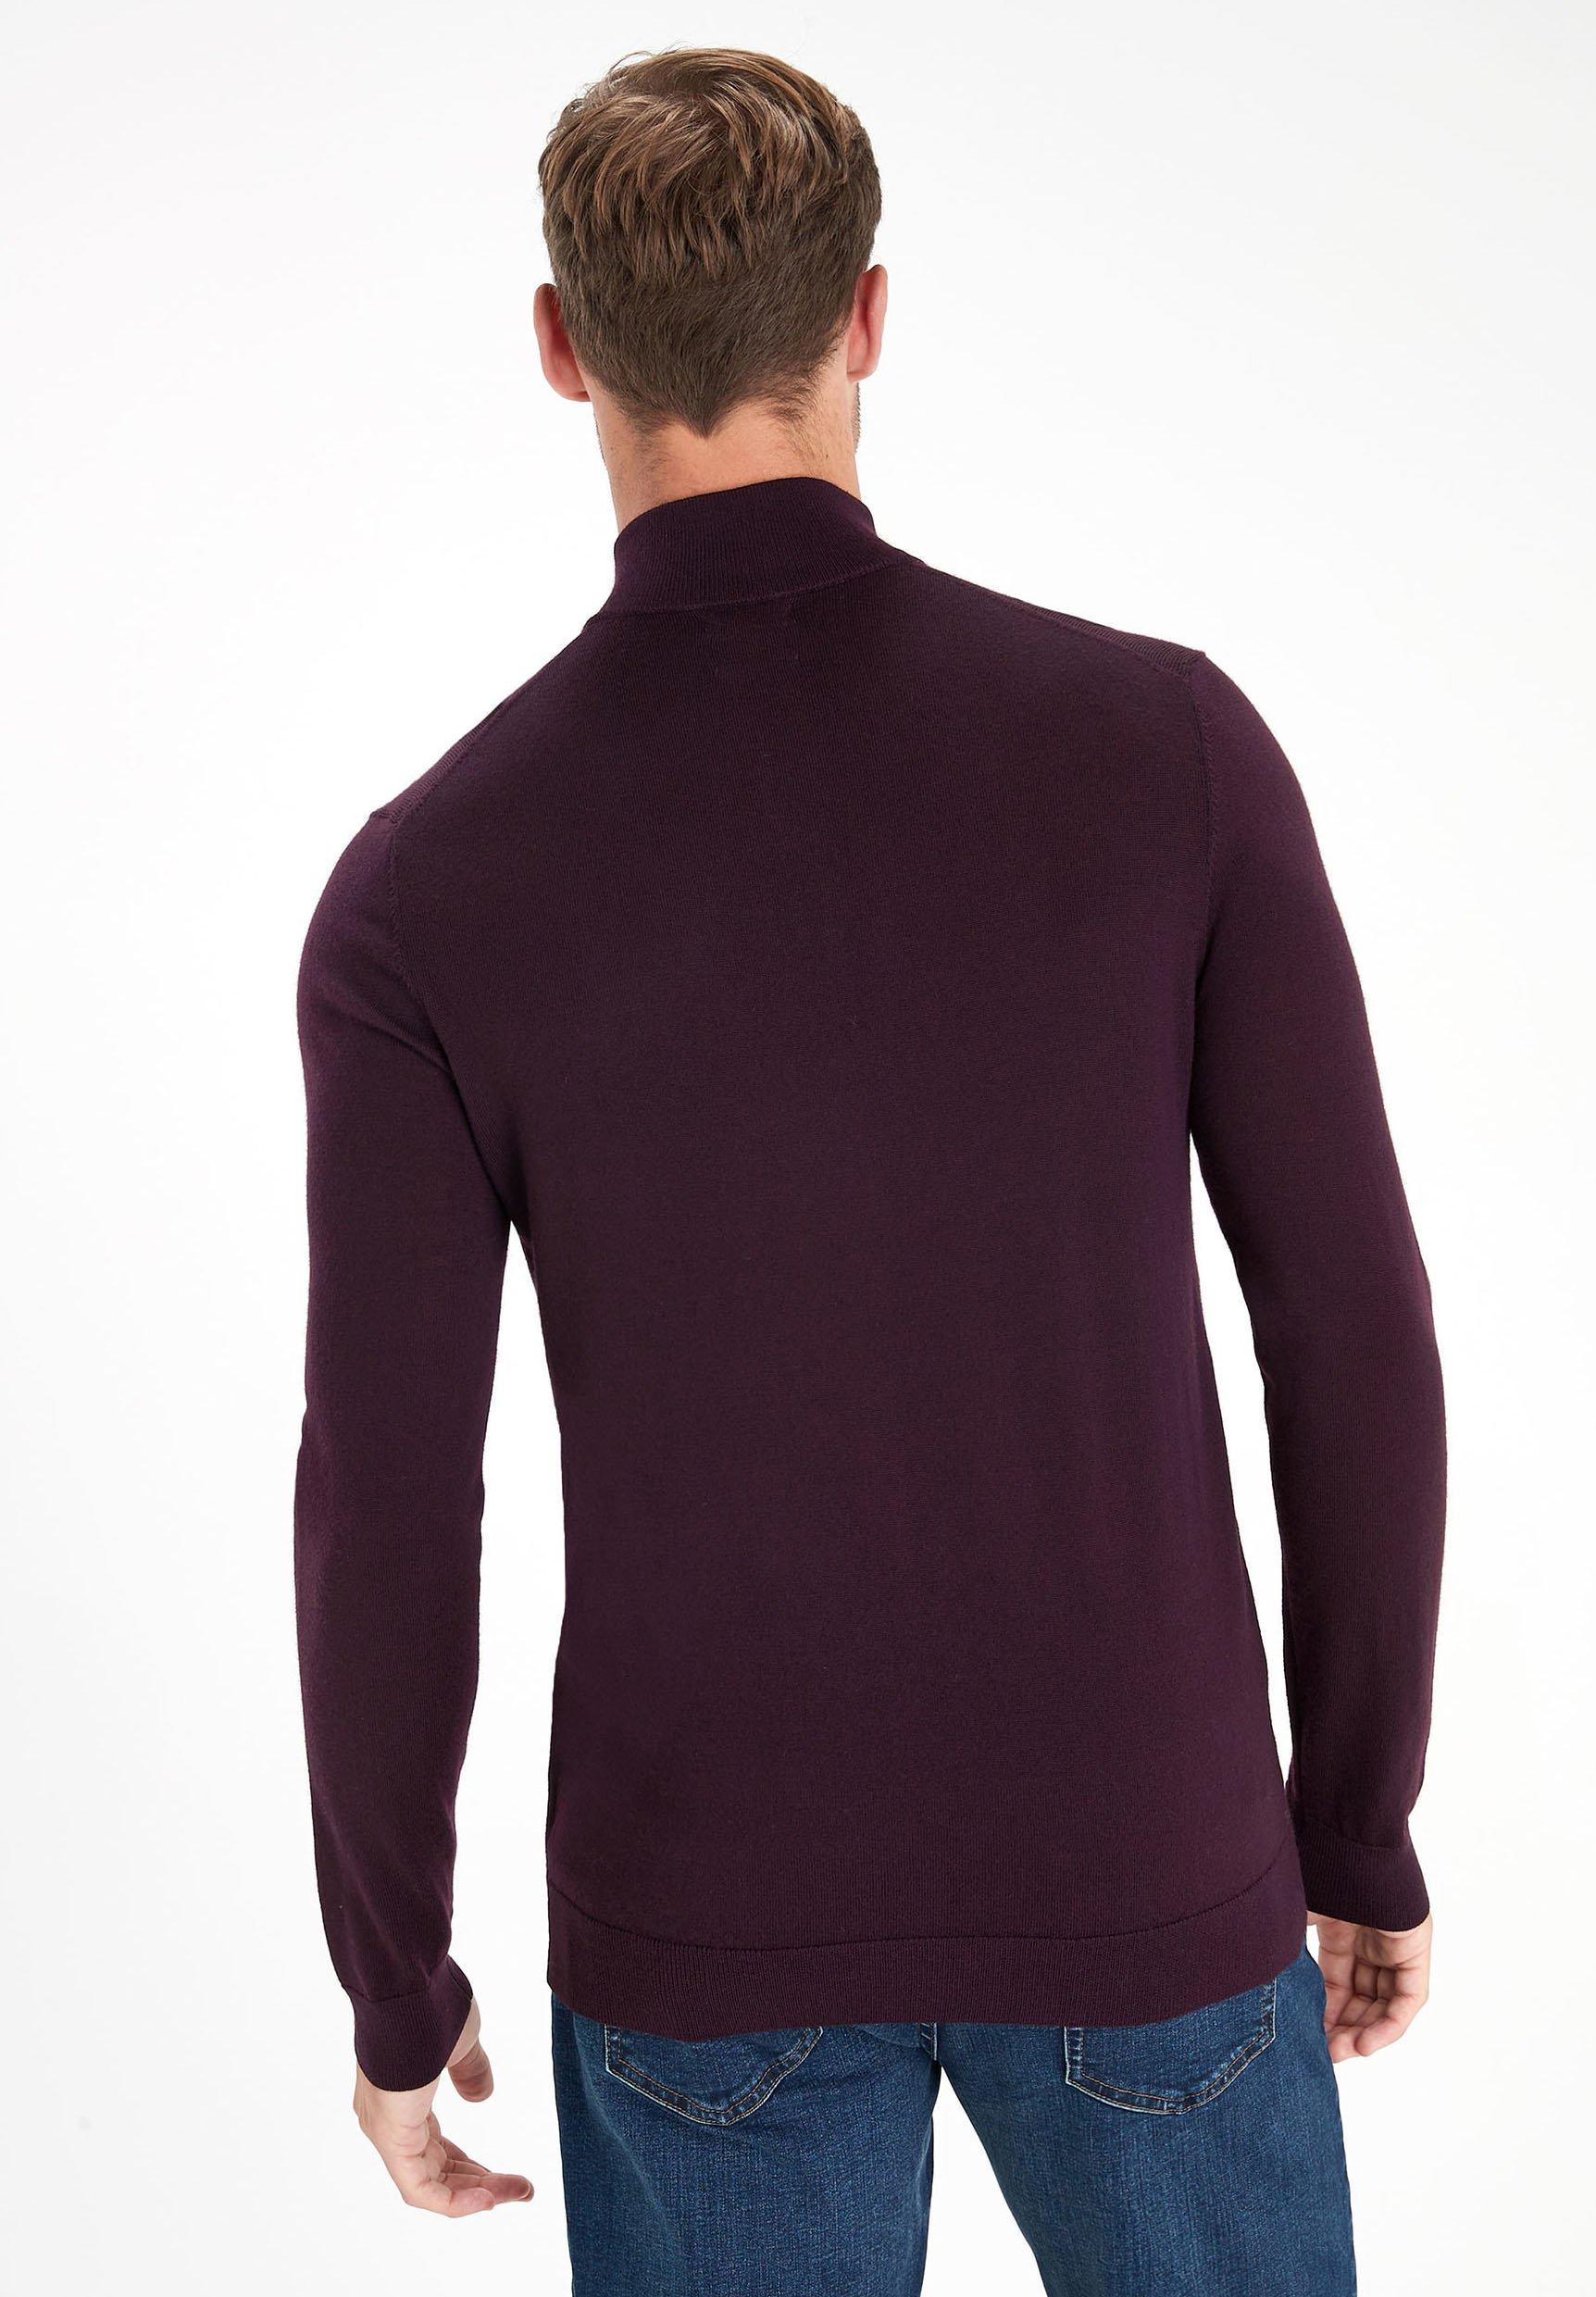 Next Pullover - purple